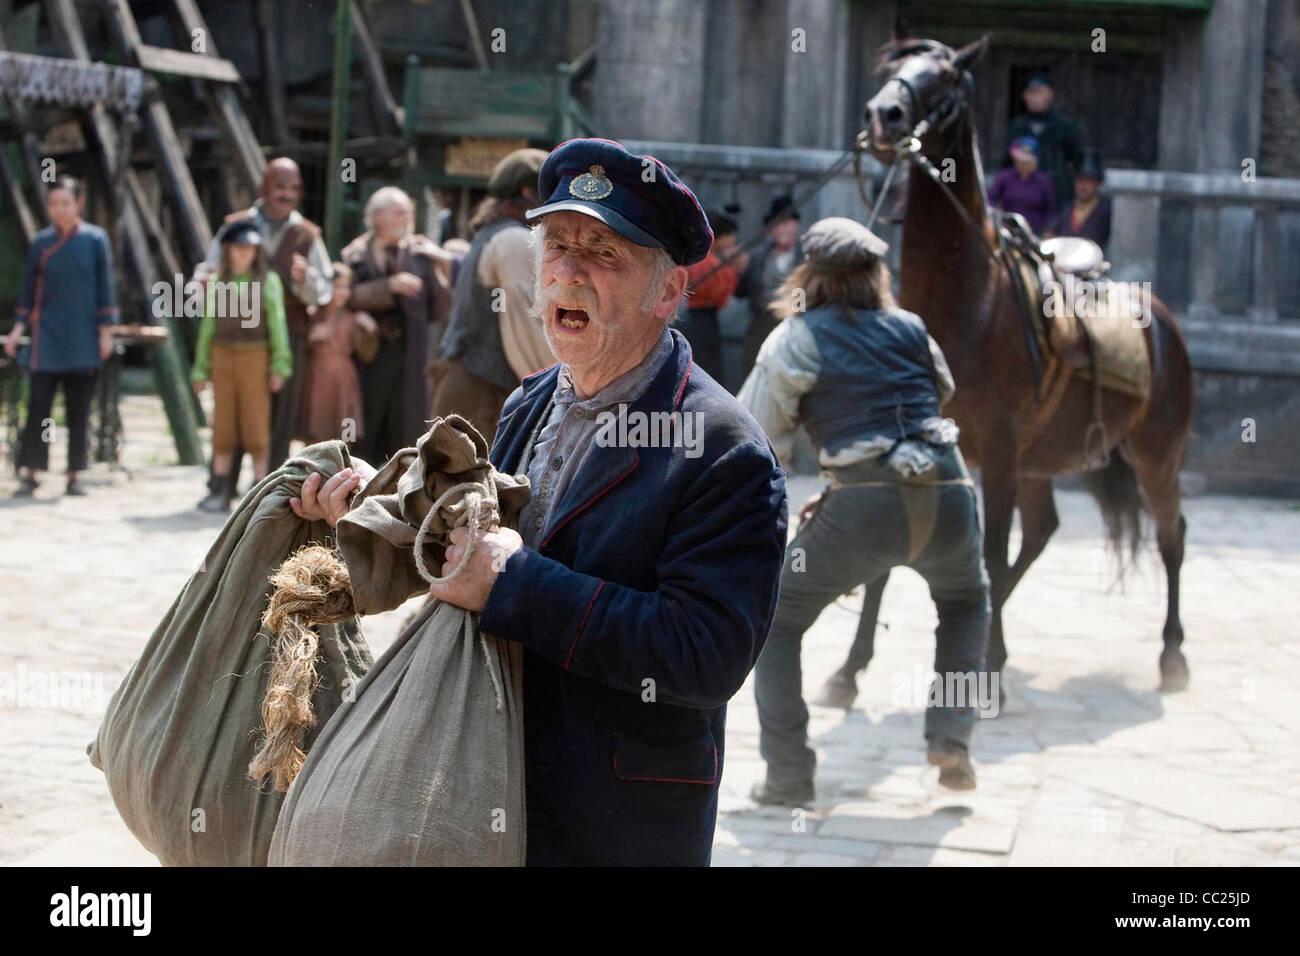 ANDREW SACHS GOING POSTAL (2010) - Stock Image